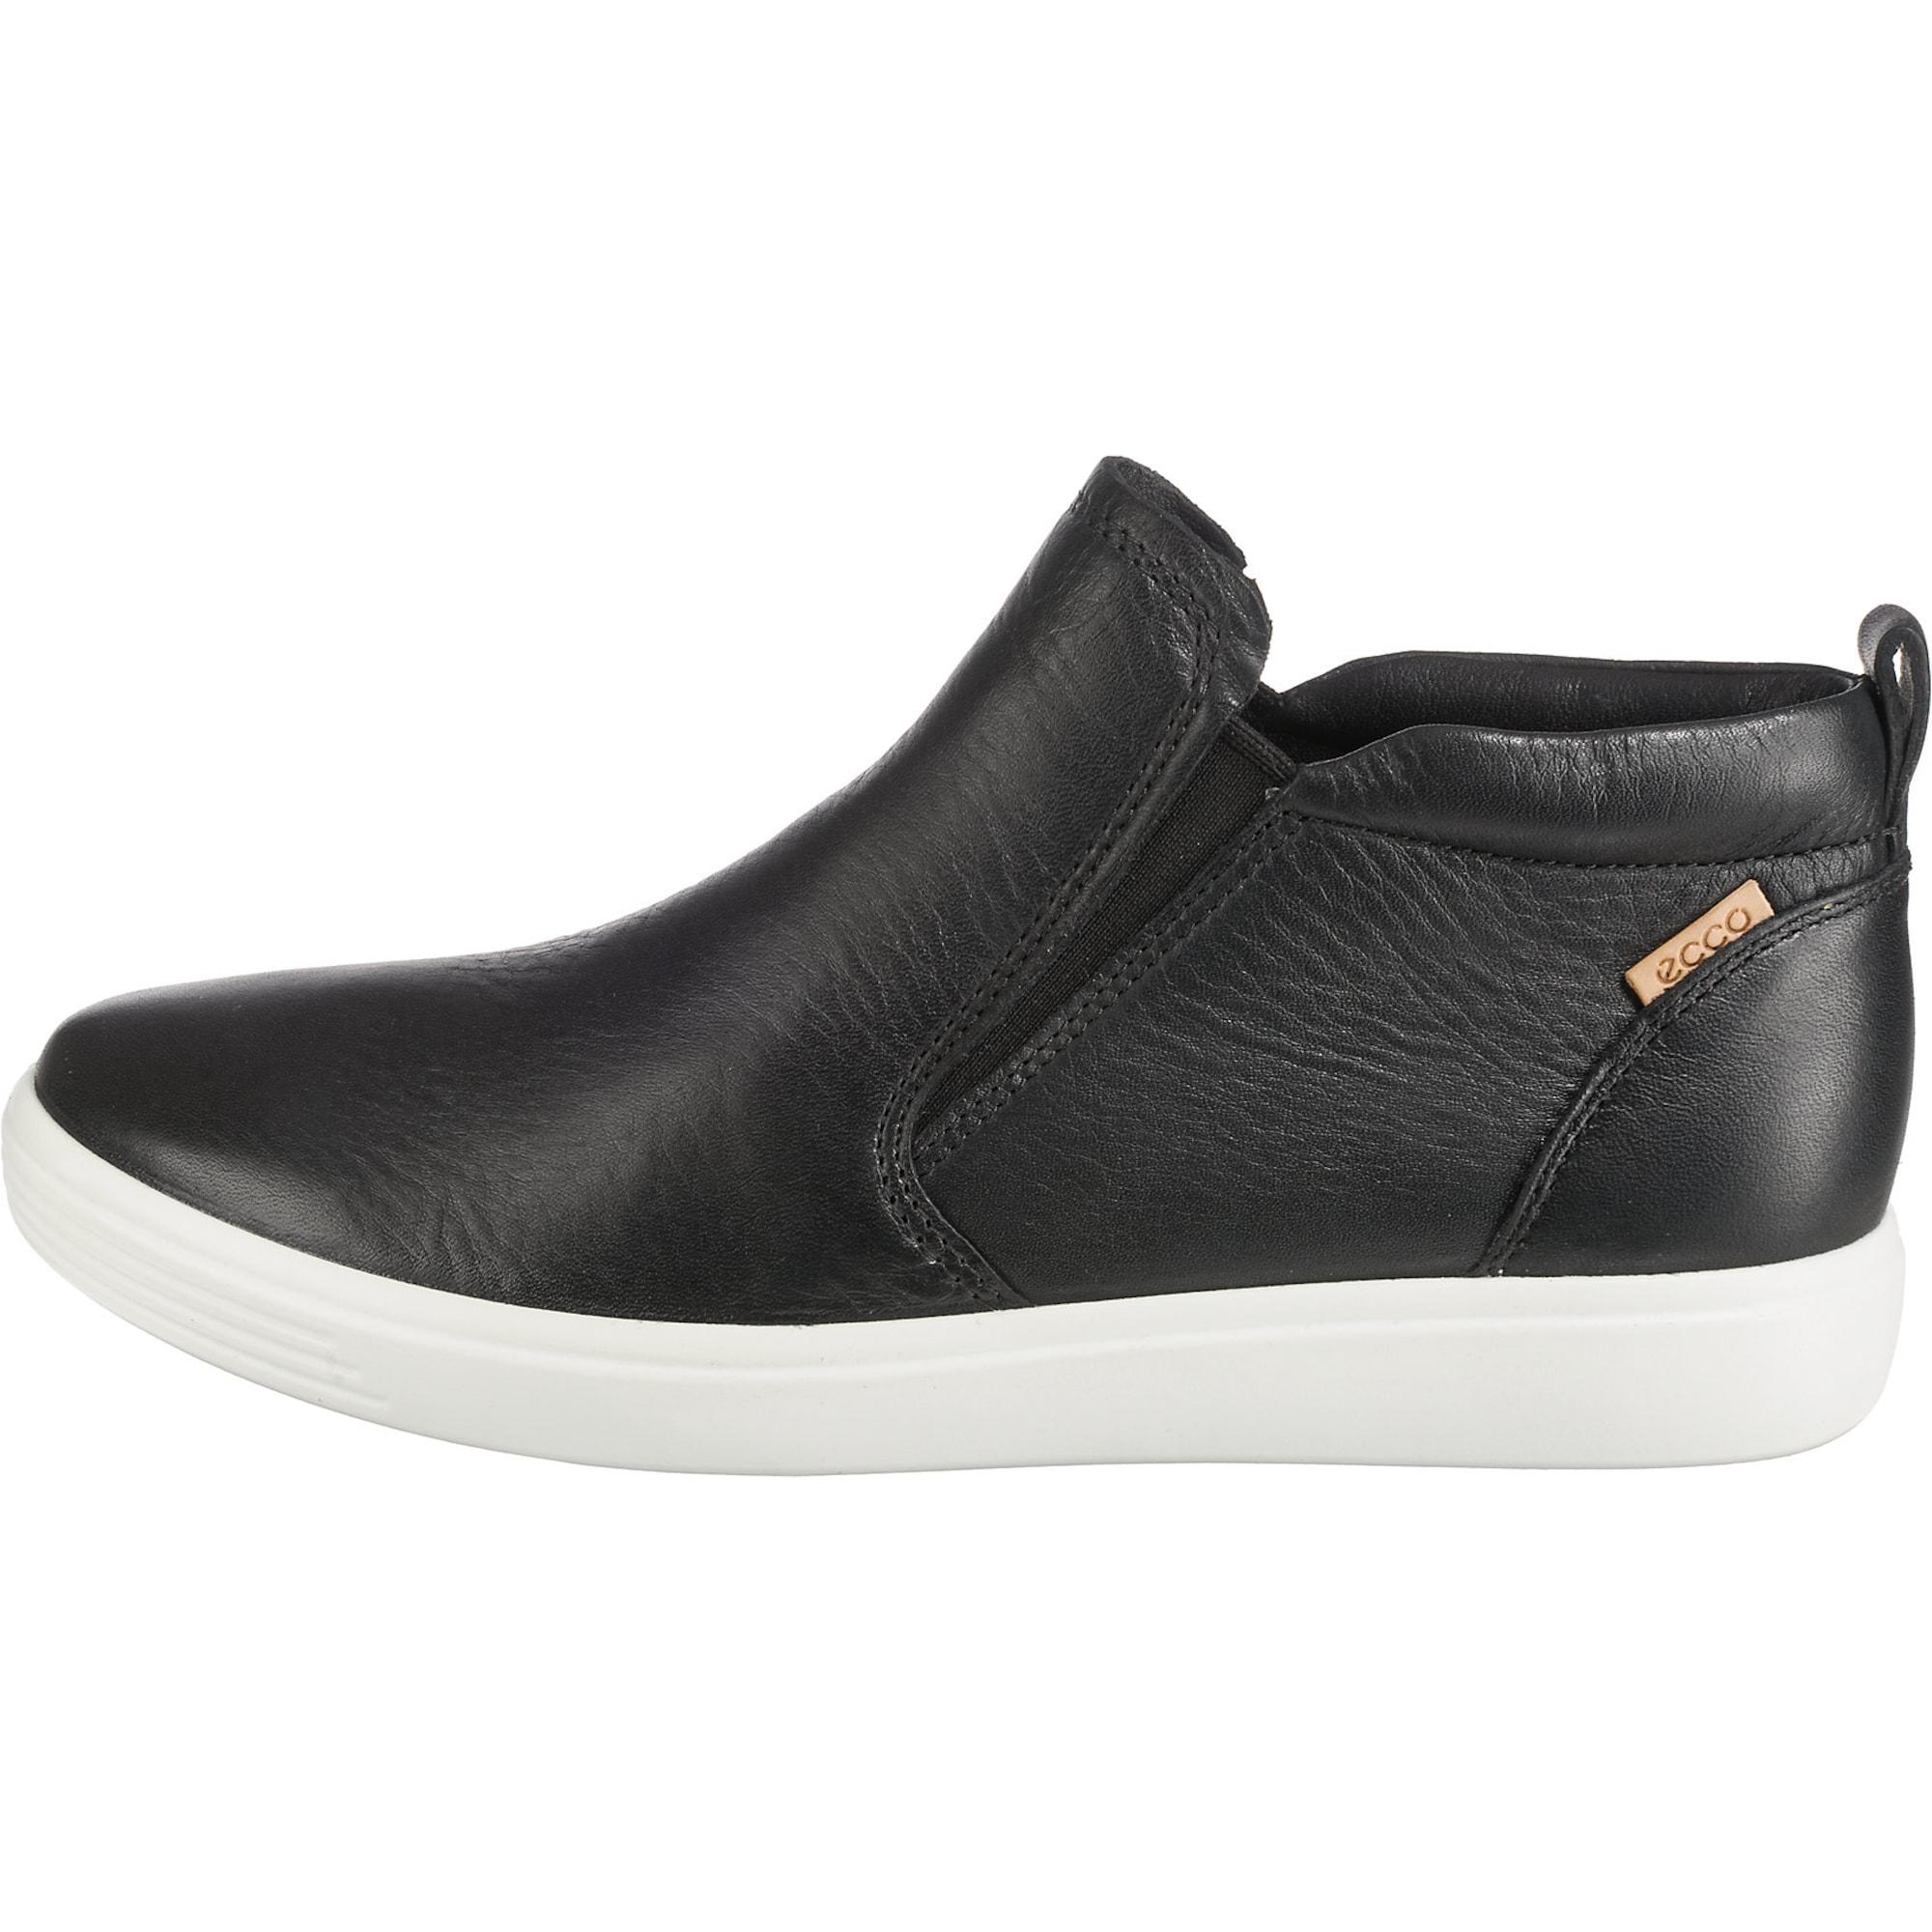 online store df0c2 656f5 AboutYou | Damen ECCO ECCO Sneakers 7 Ladies apricot ...